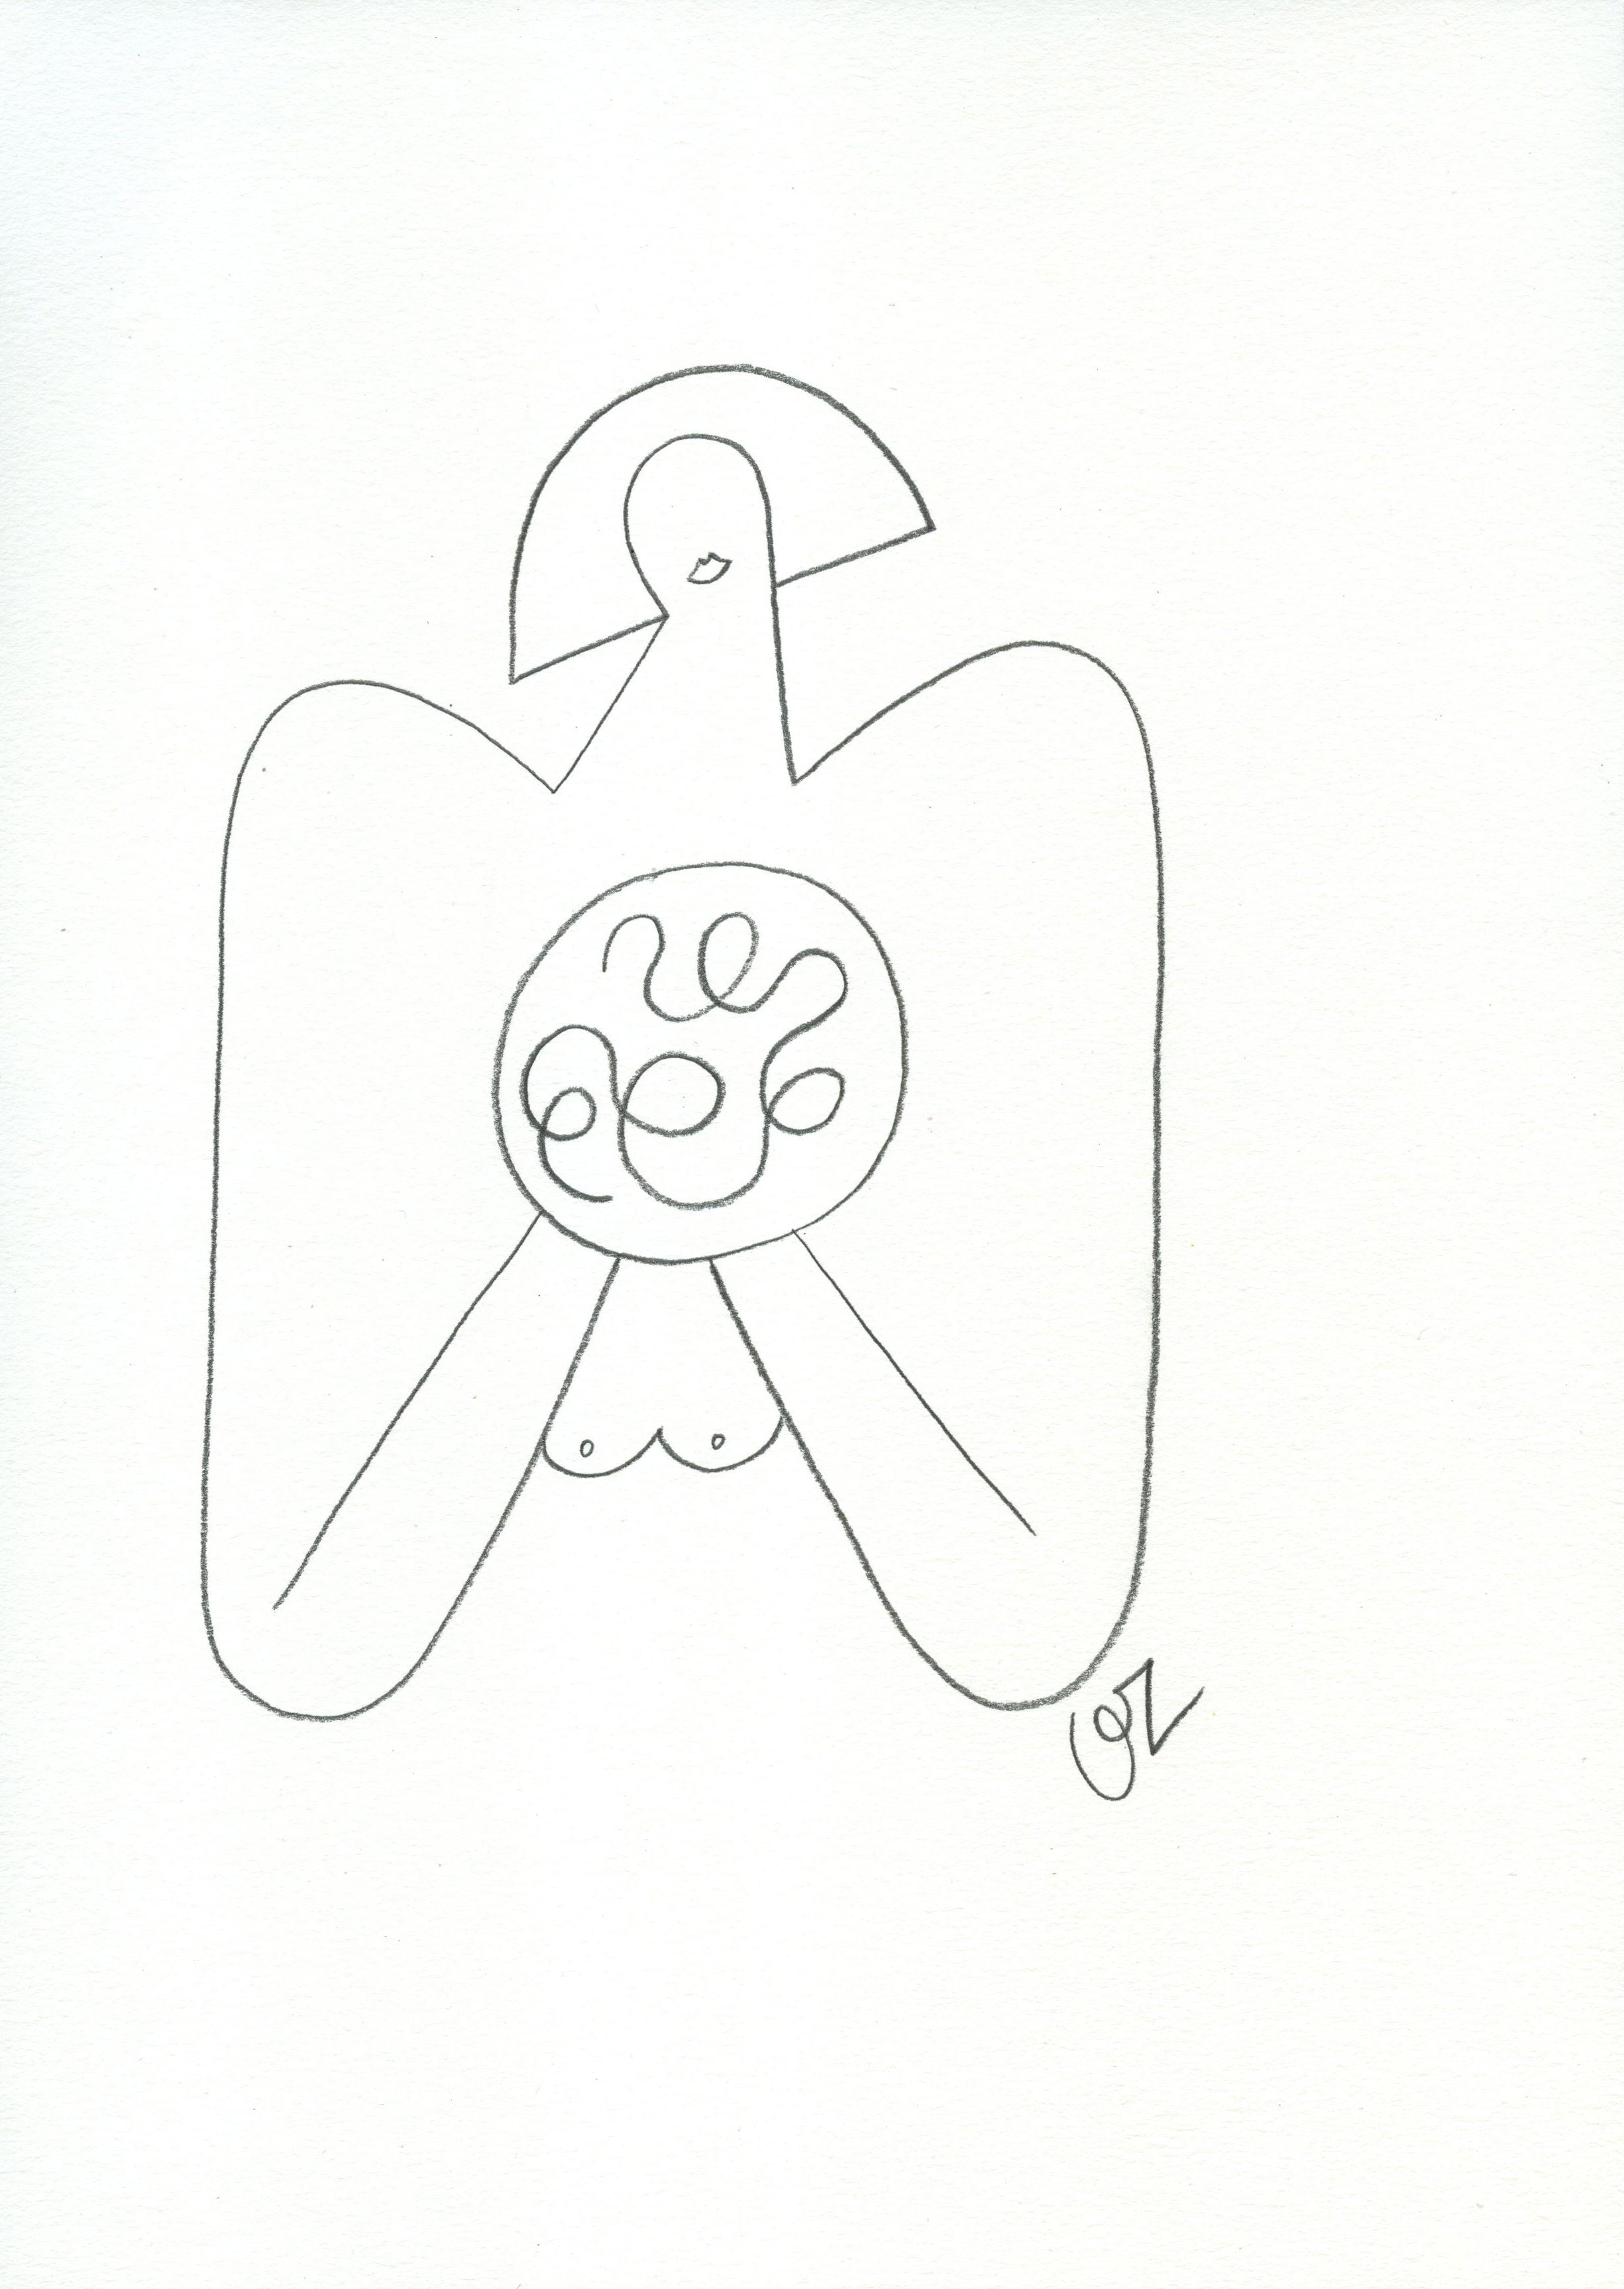 Olimpia Zagnoli, How to eat spaghetti like a lady3, 2017, pencil on paper, 29×21 cm